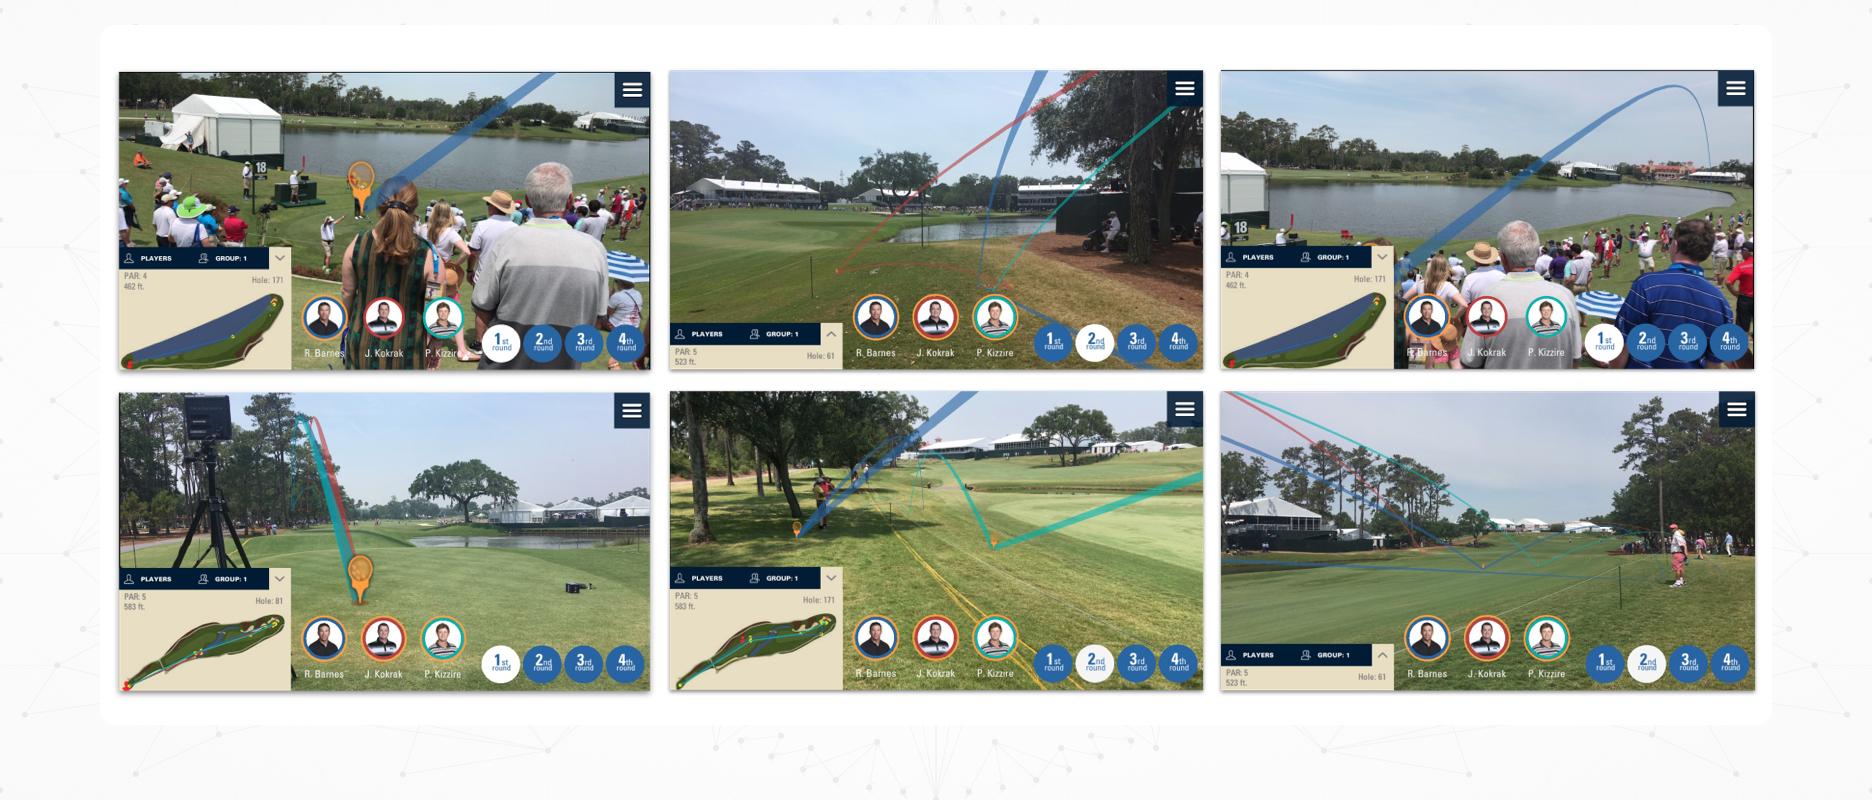 PGA TOUR AR - Case Study Image - User Testing